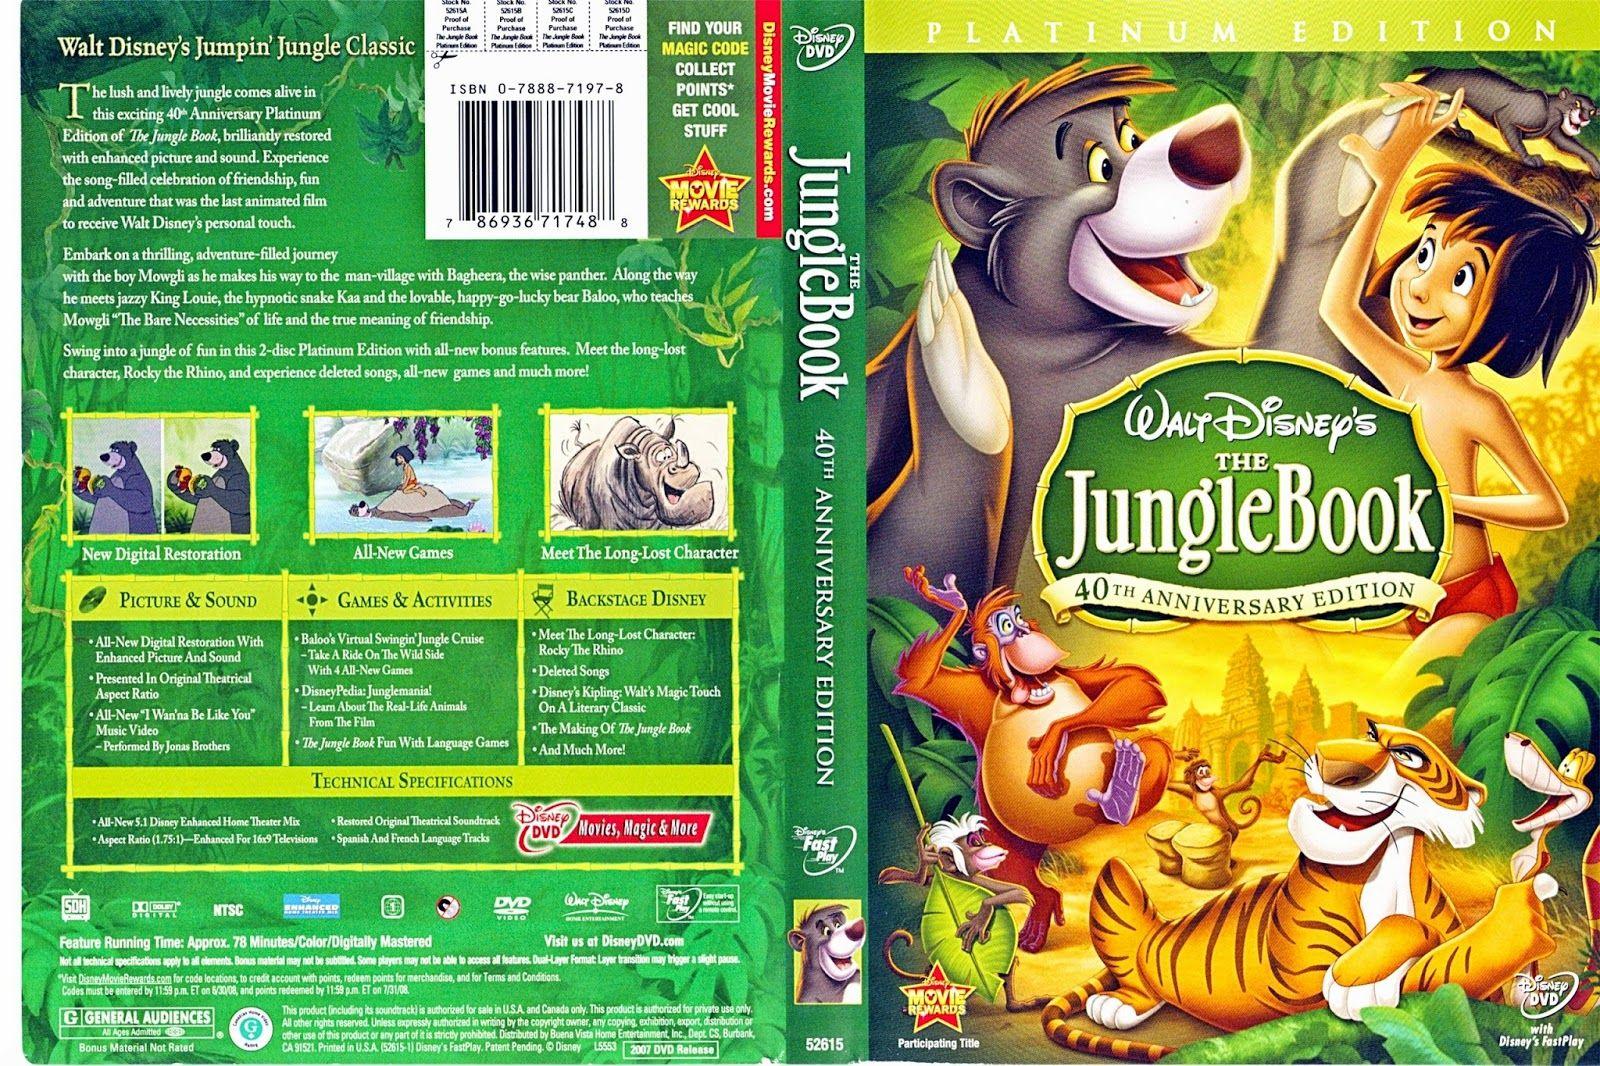 printable dvd cover